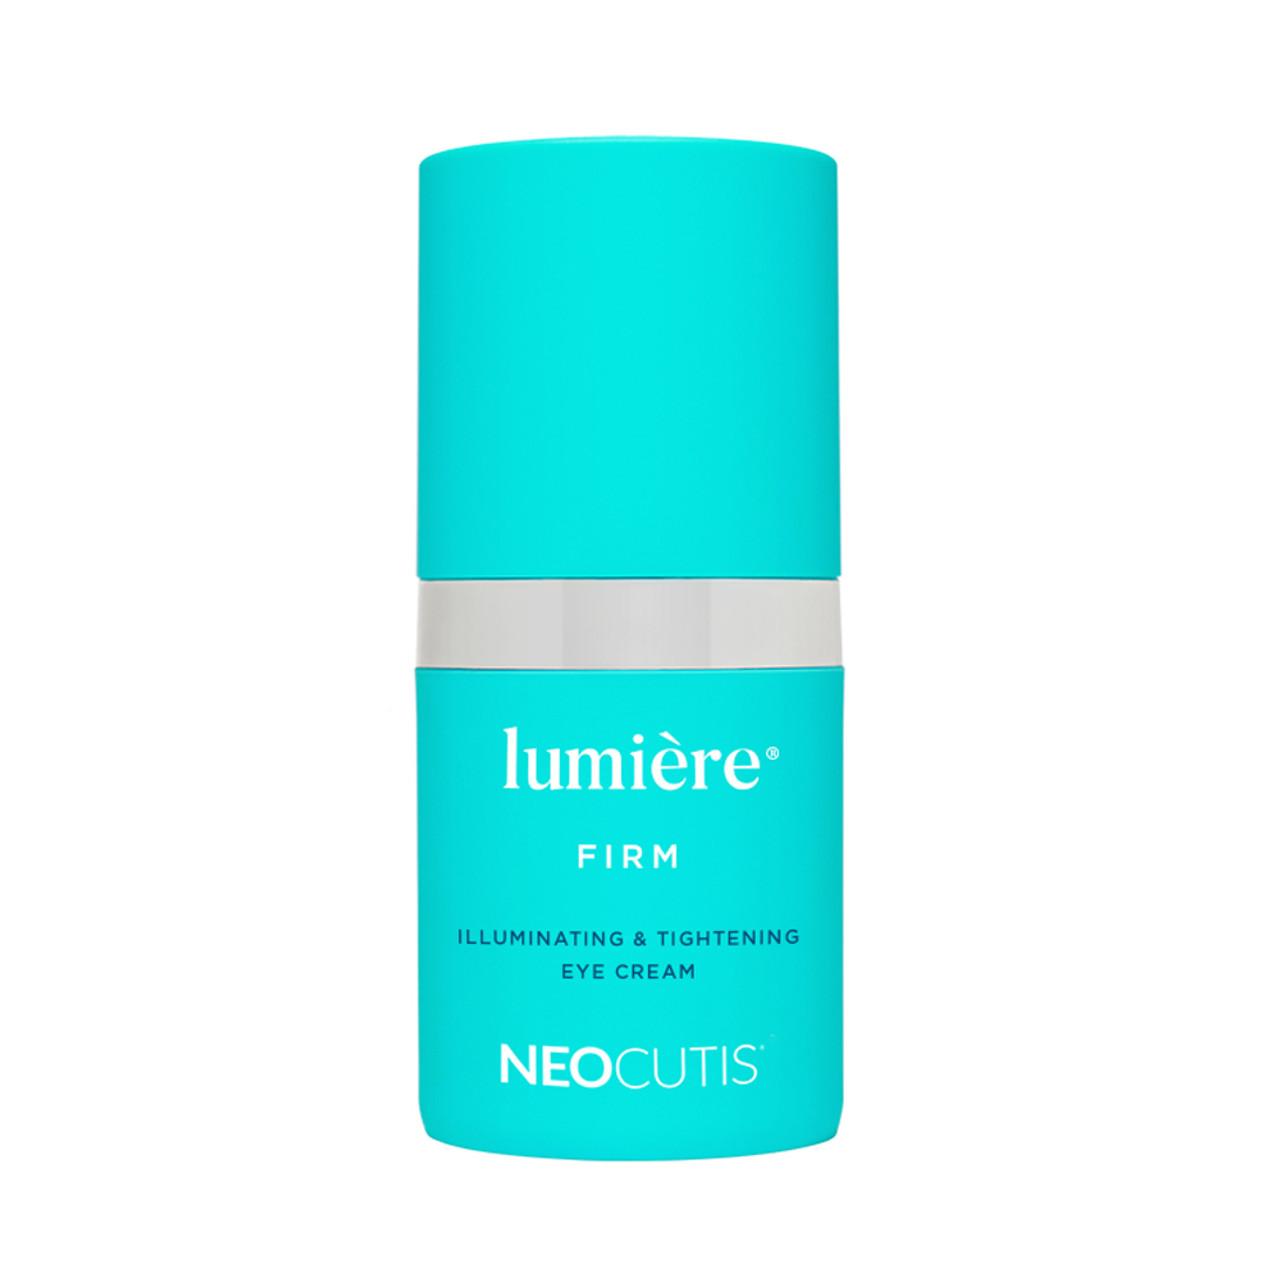 Neocutis Lumiere Firm Illuminating & Tightening Eye Cream